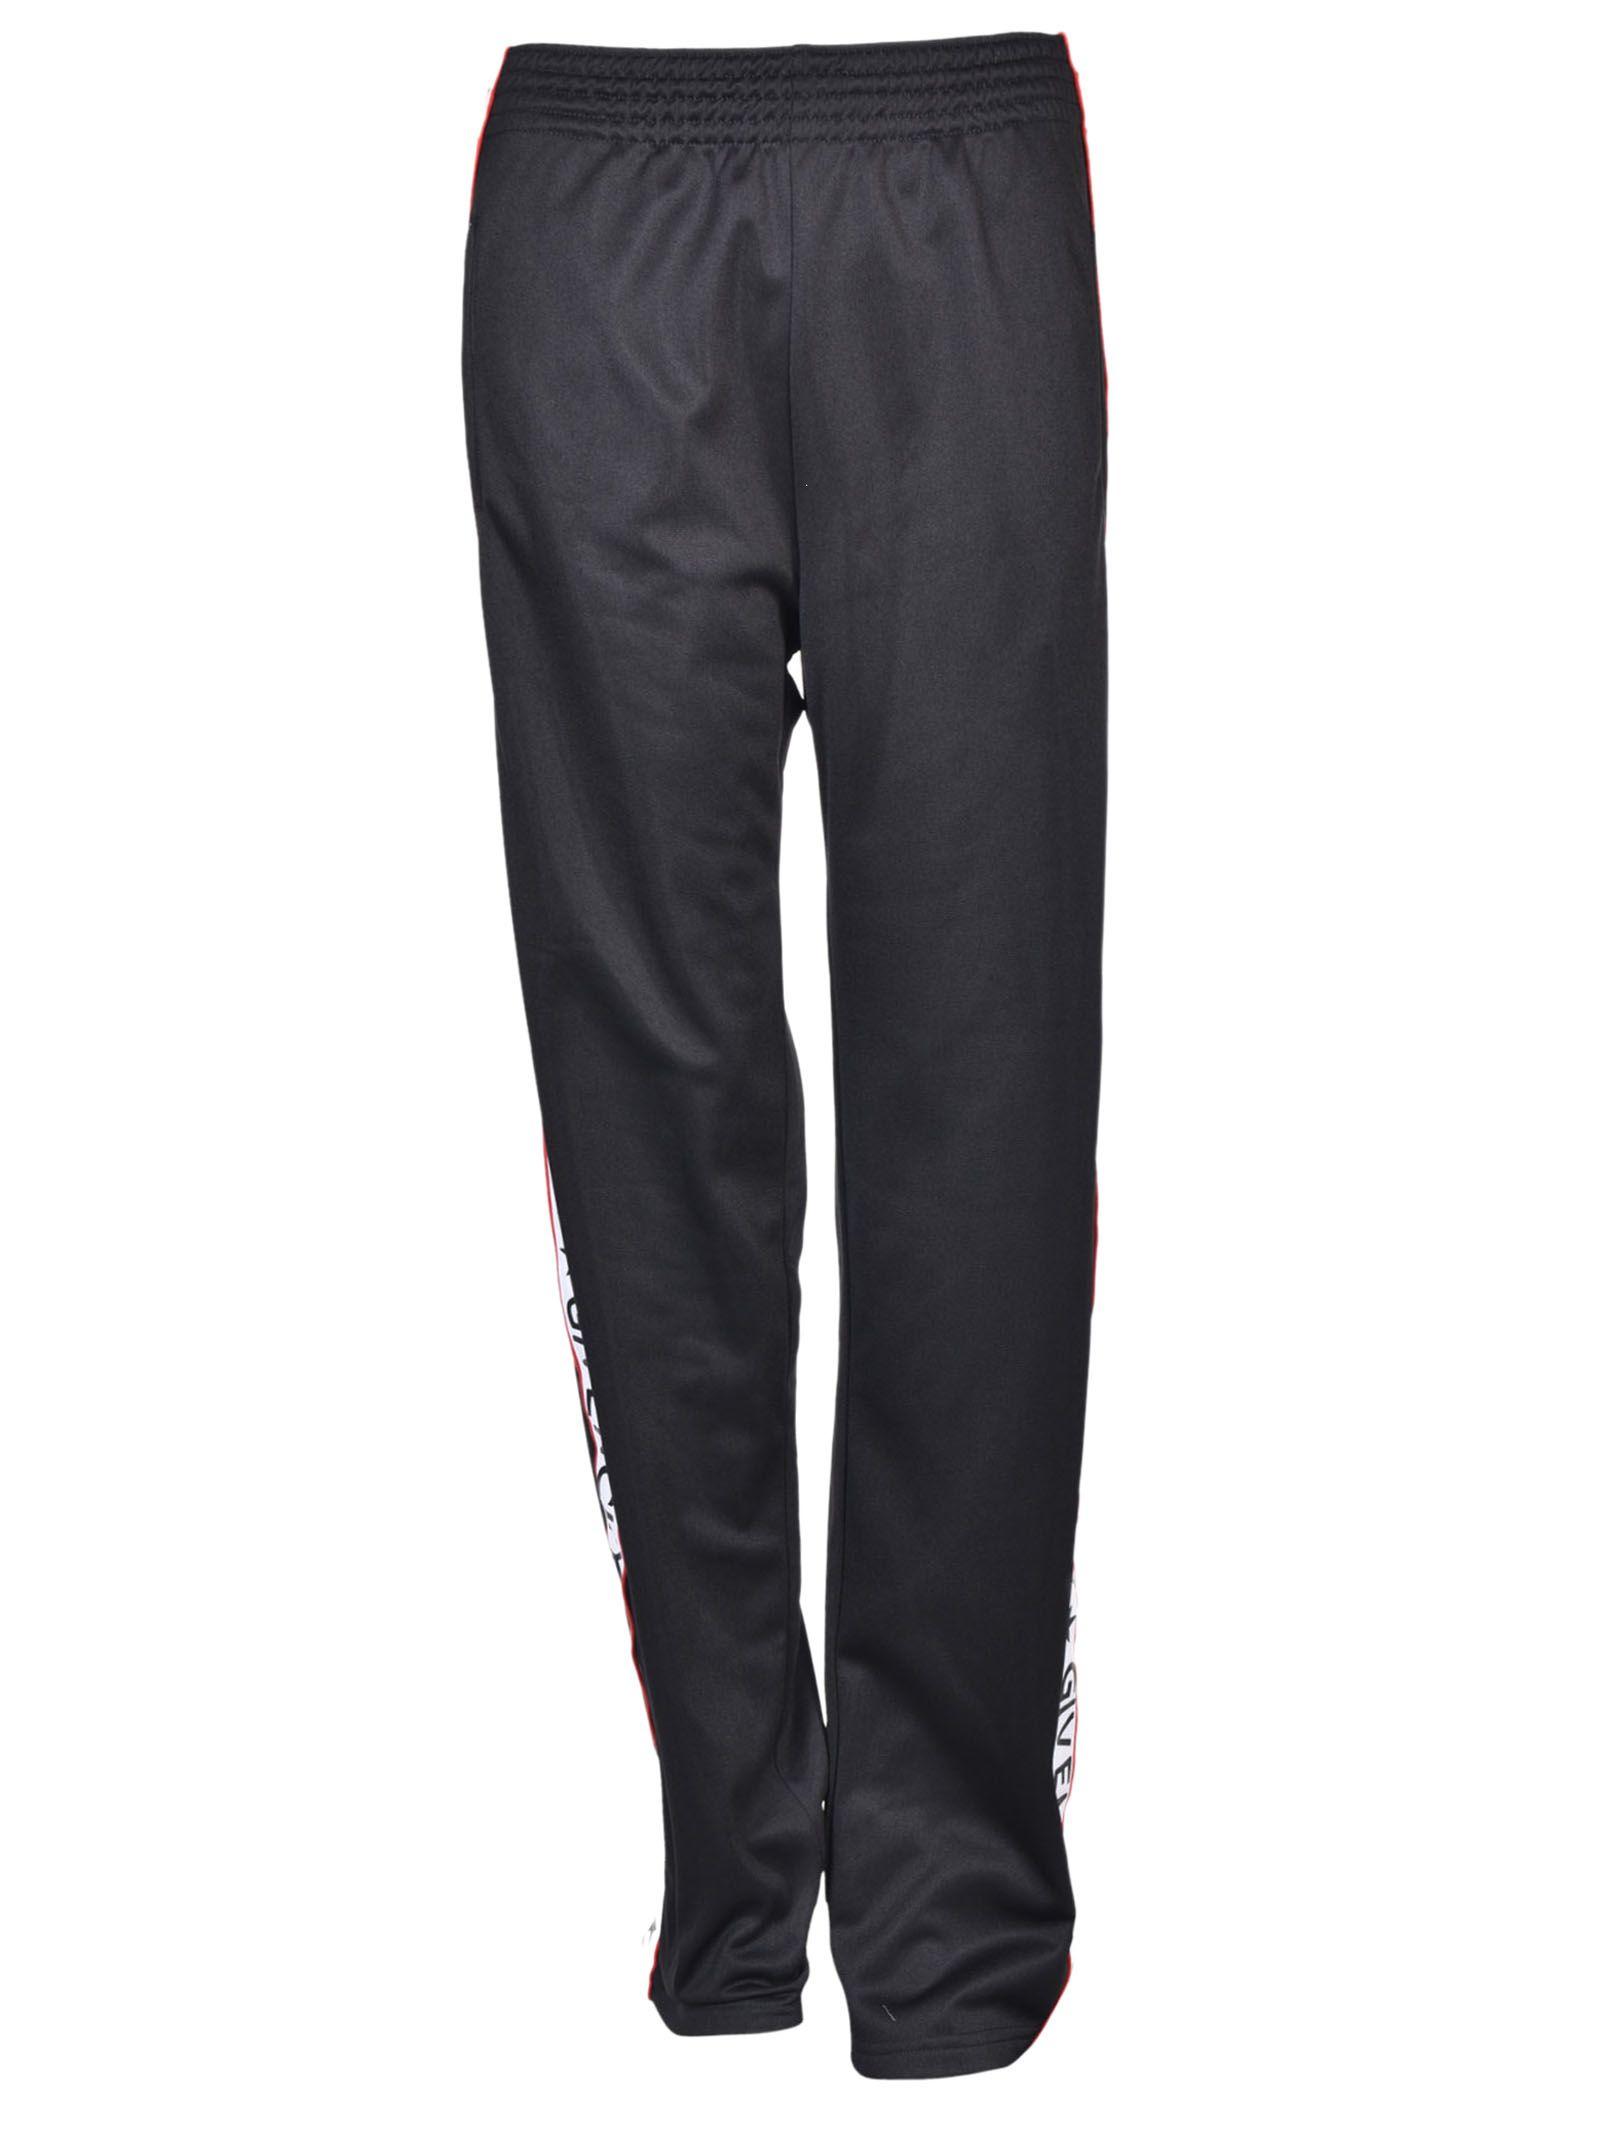 Mens Logo Pantalon De Survêtement En Polaire Givenchy xjZ0UFZ